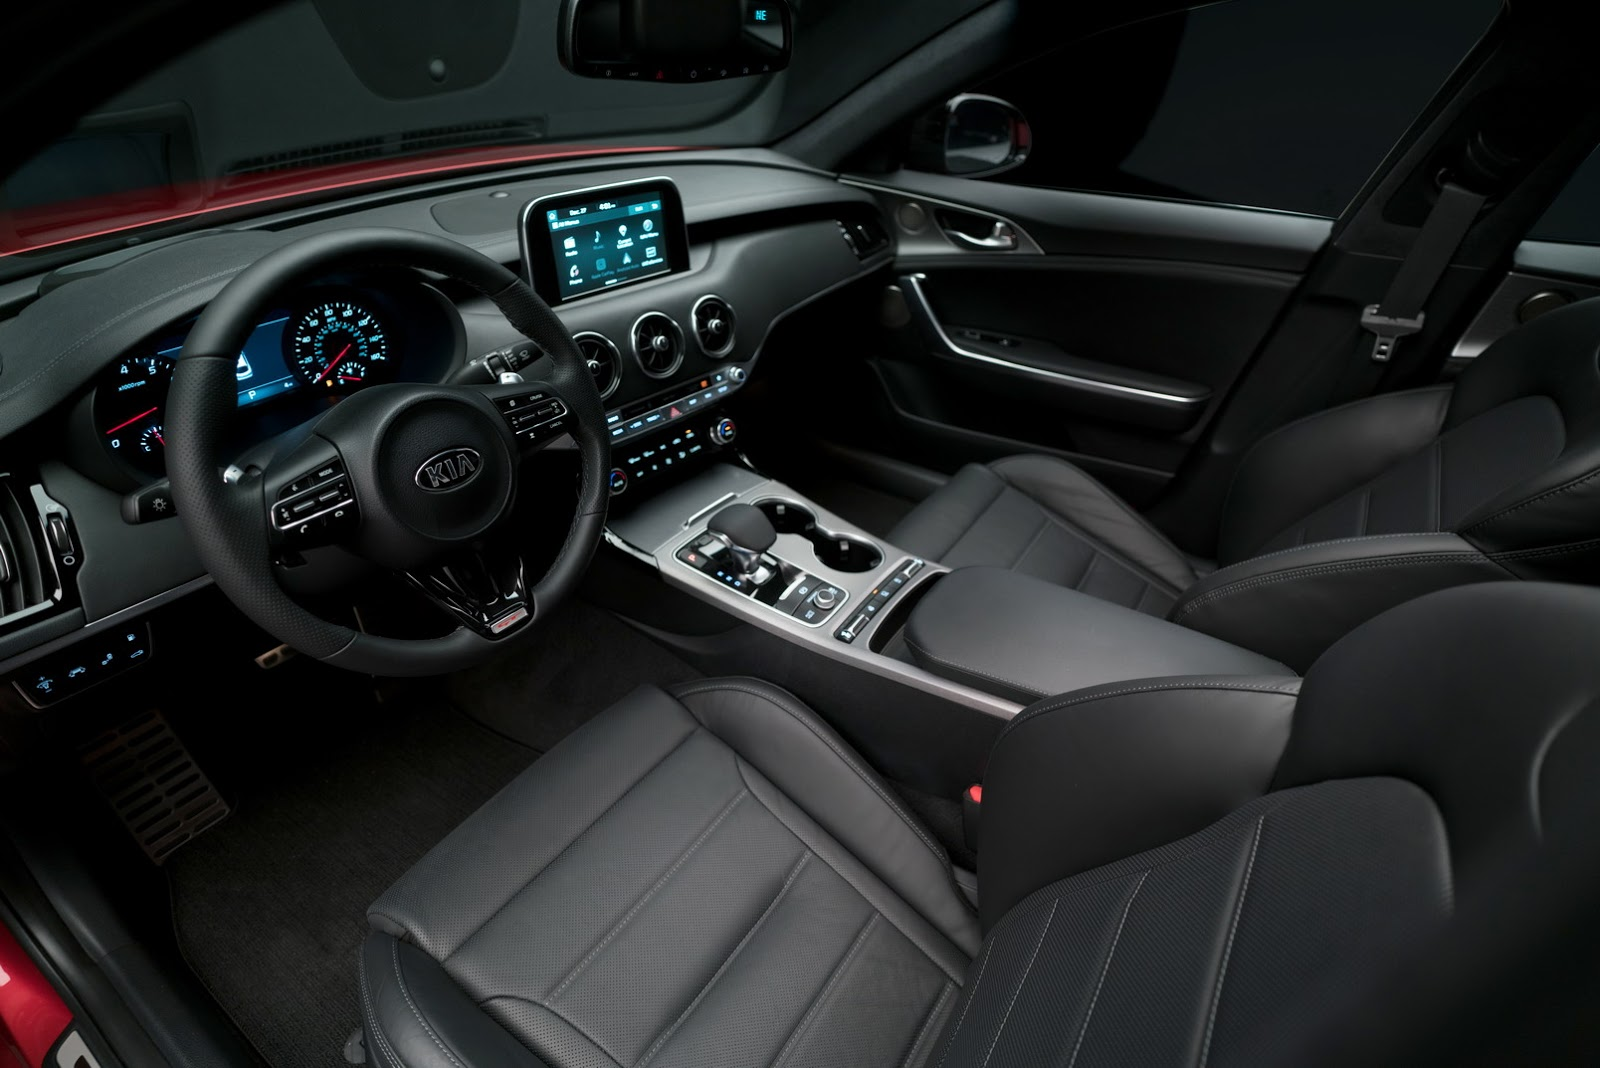 2018 Kia Stinger GT (14)